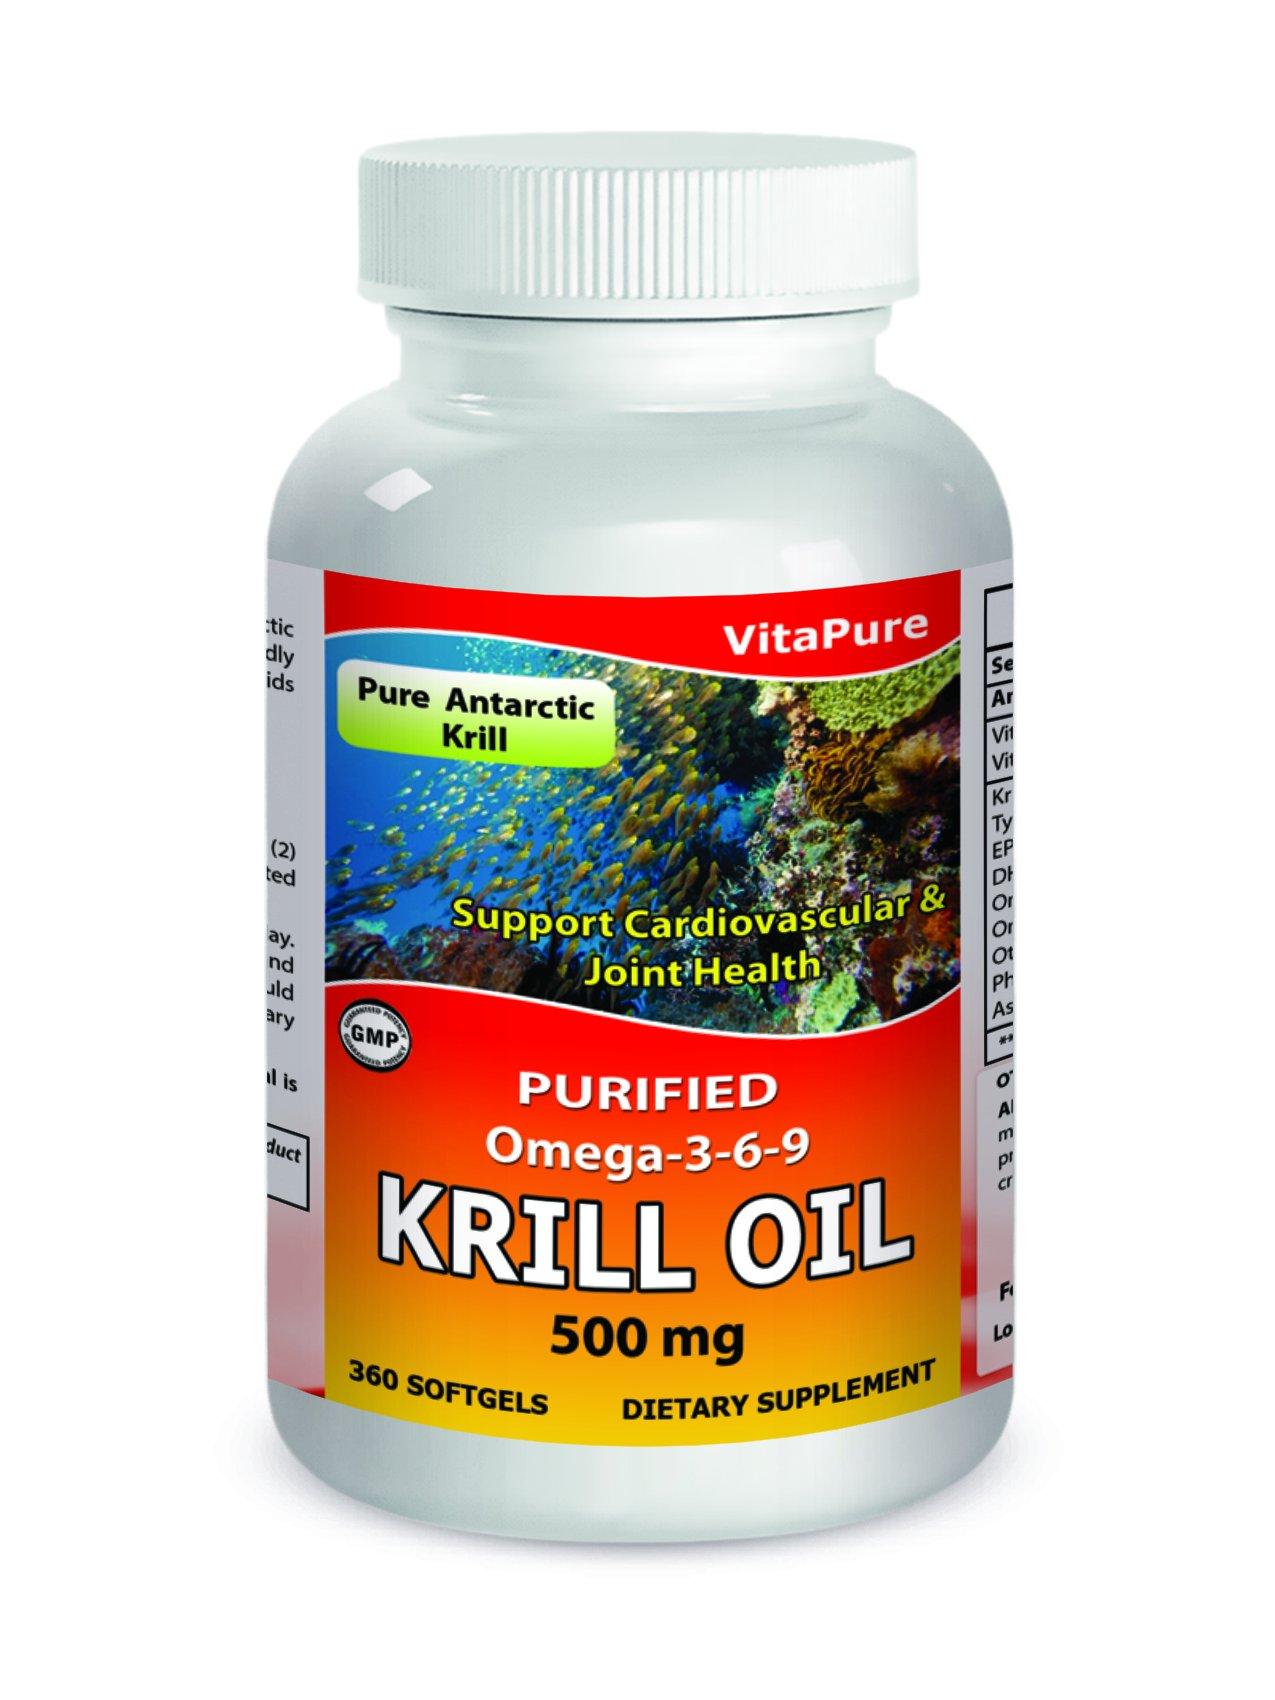 Vitapure Krill Oil 500 mg 360 Softgels by Pure Vita